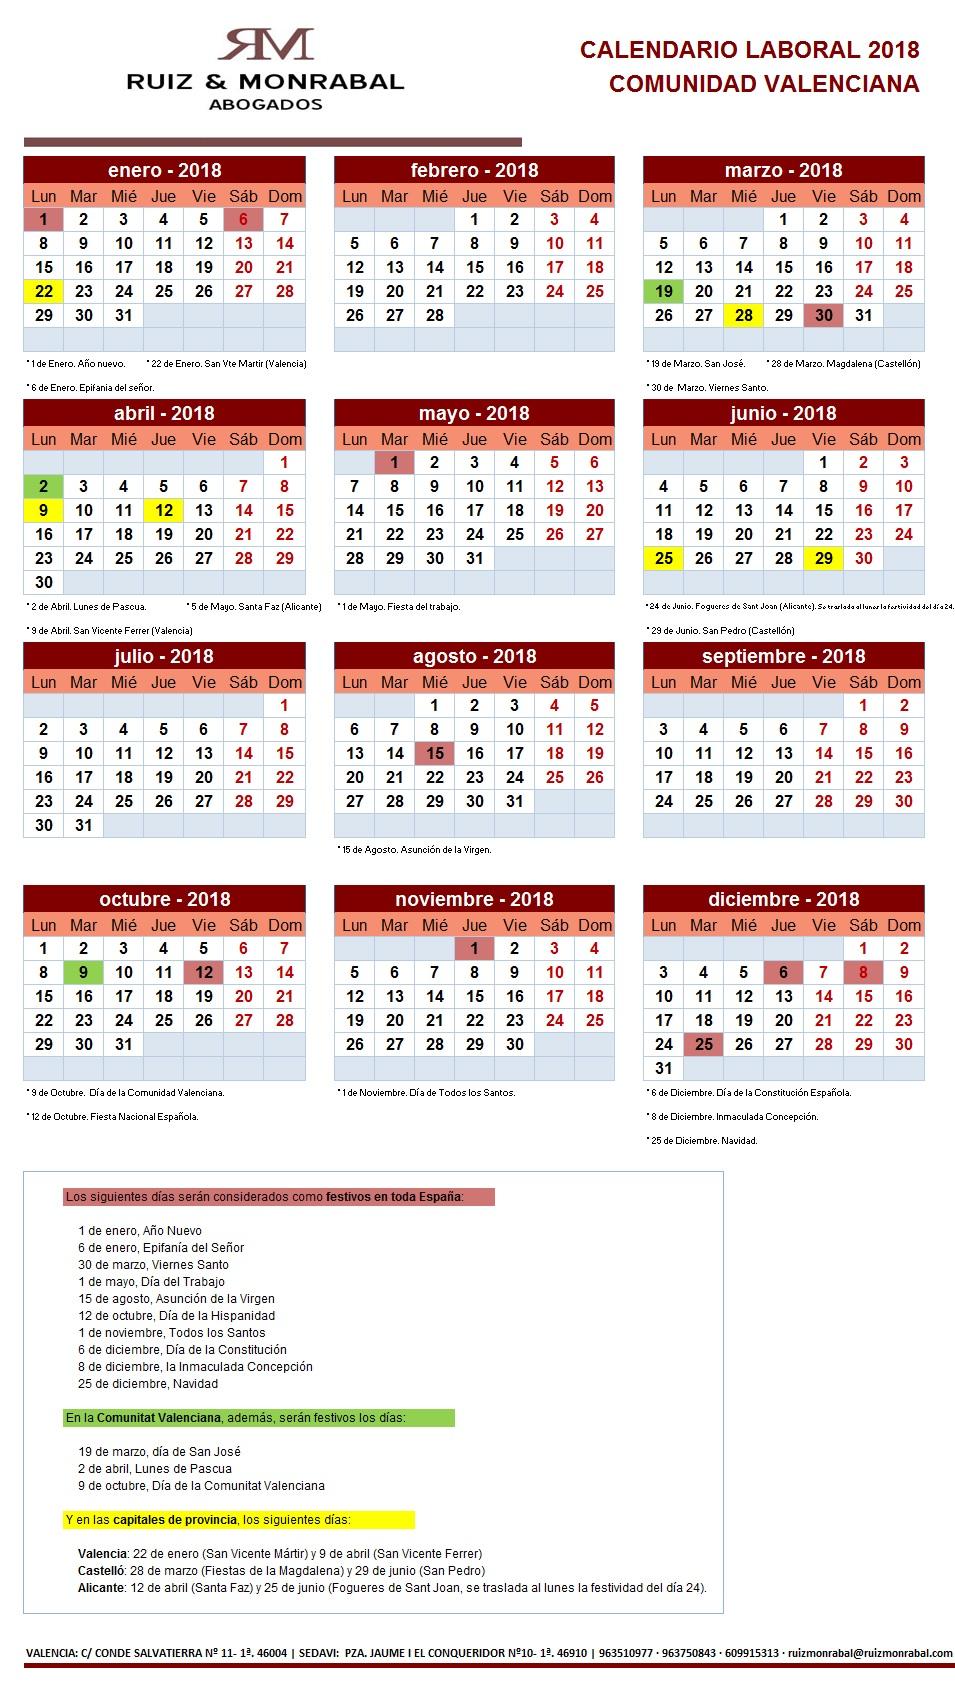 Calendario laboral 2018 en valencia for Festivos alicante 2017